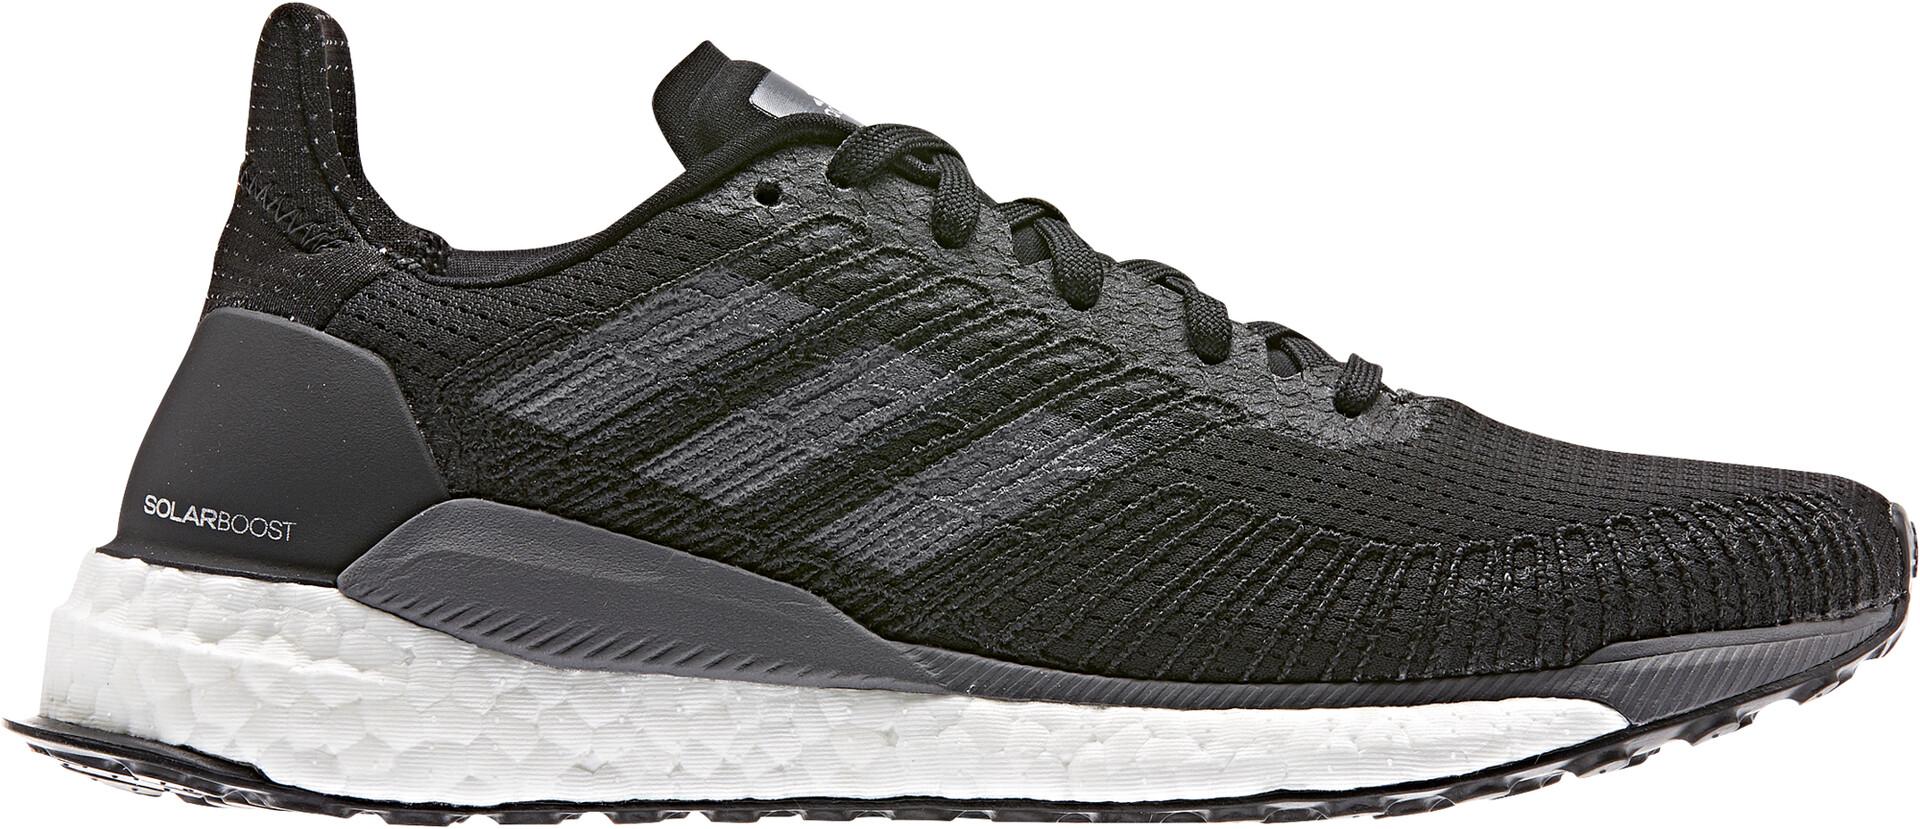 Adidas Core Boost Damen 19 Low Solar Five Cut Schuhe Blackcarbongrey MqSUpzV